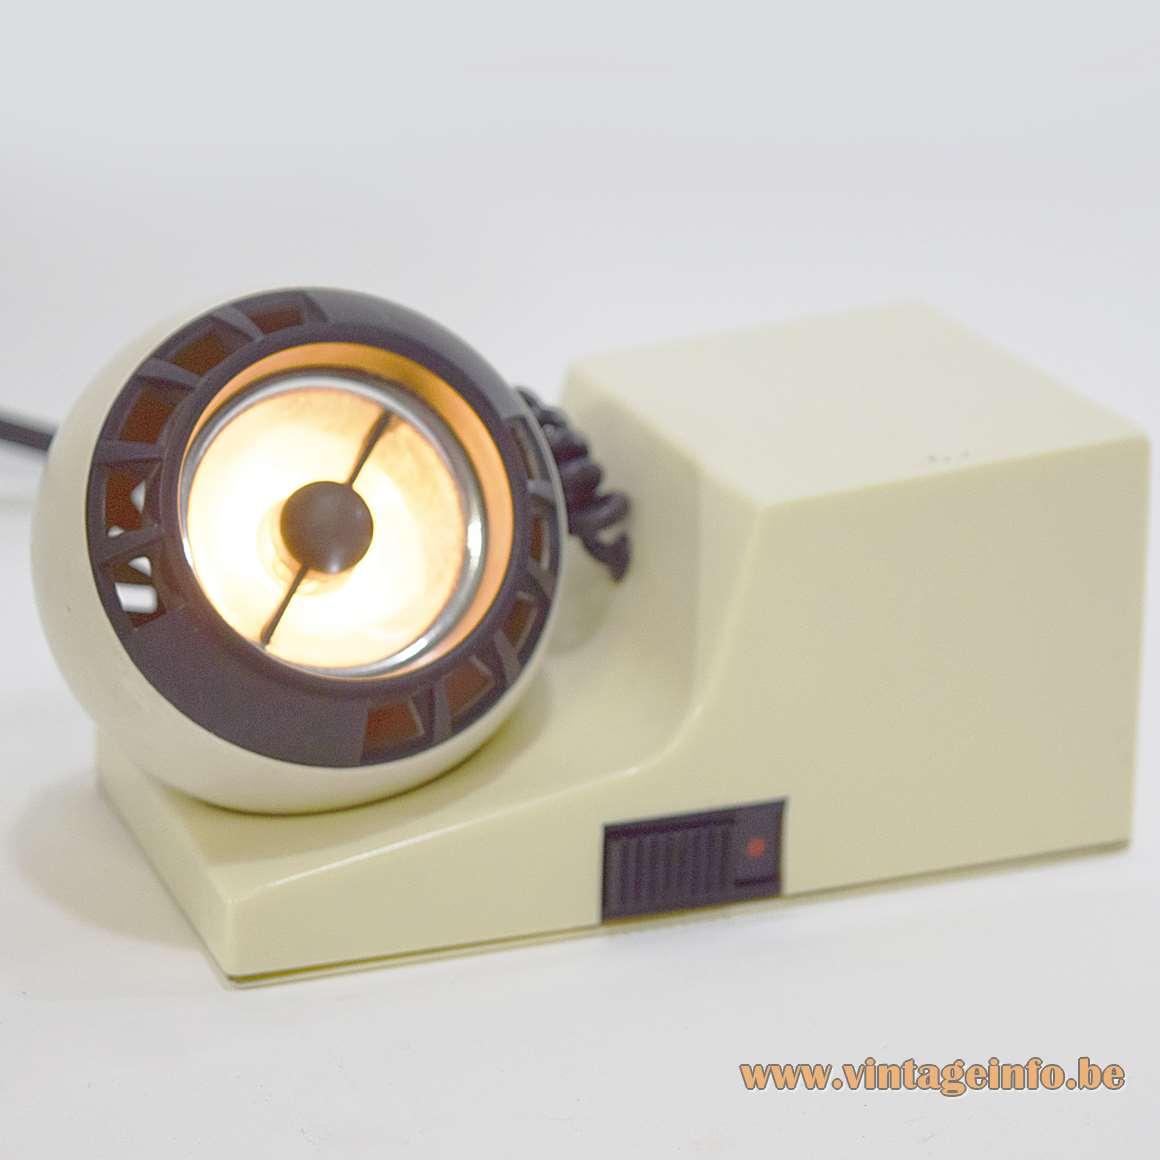 Light 3 - Osram Minispot II - 41701 - 1972 - Osram Design